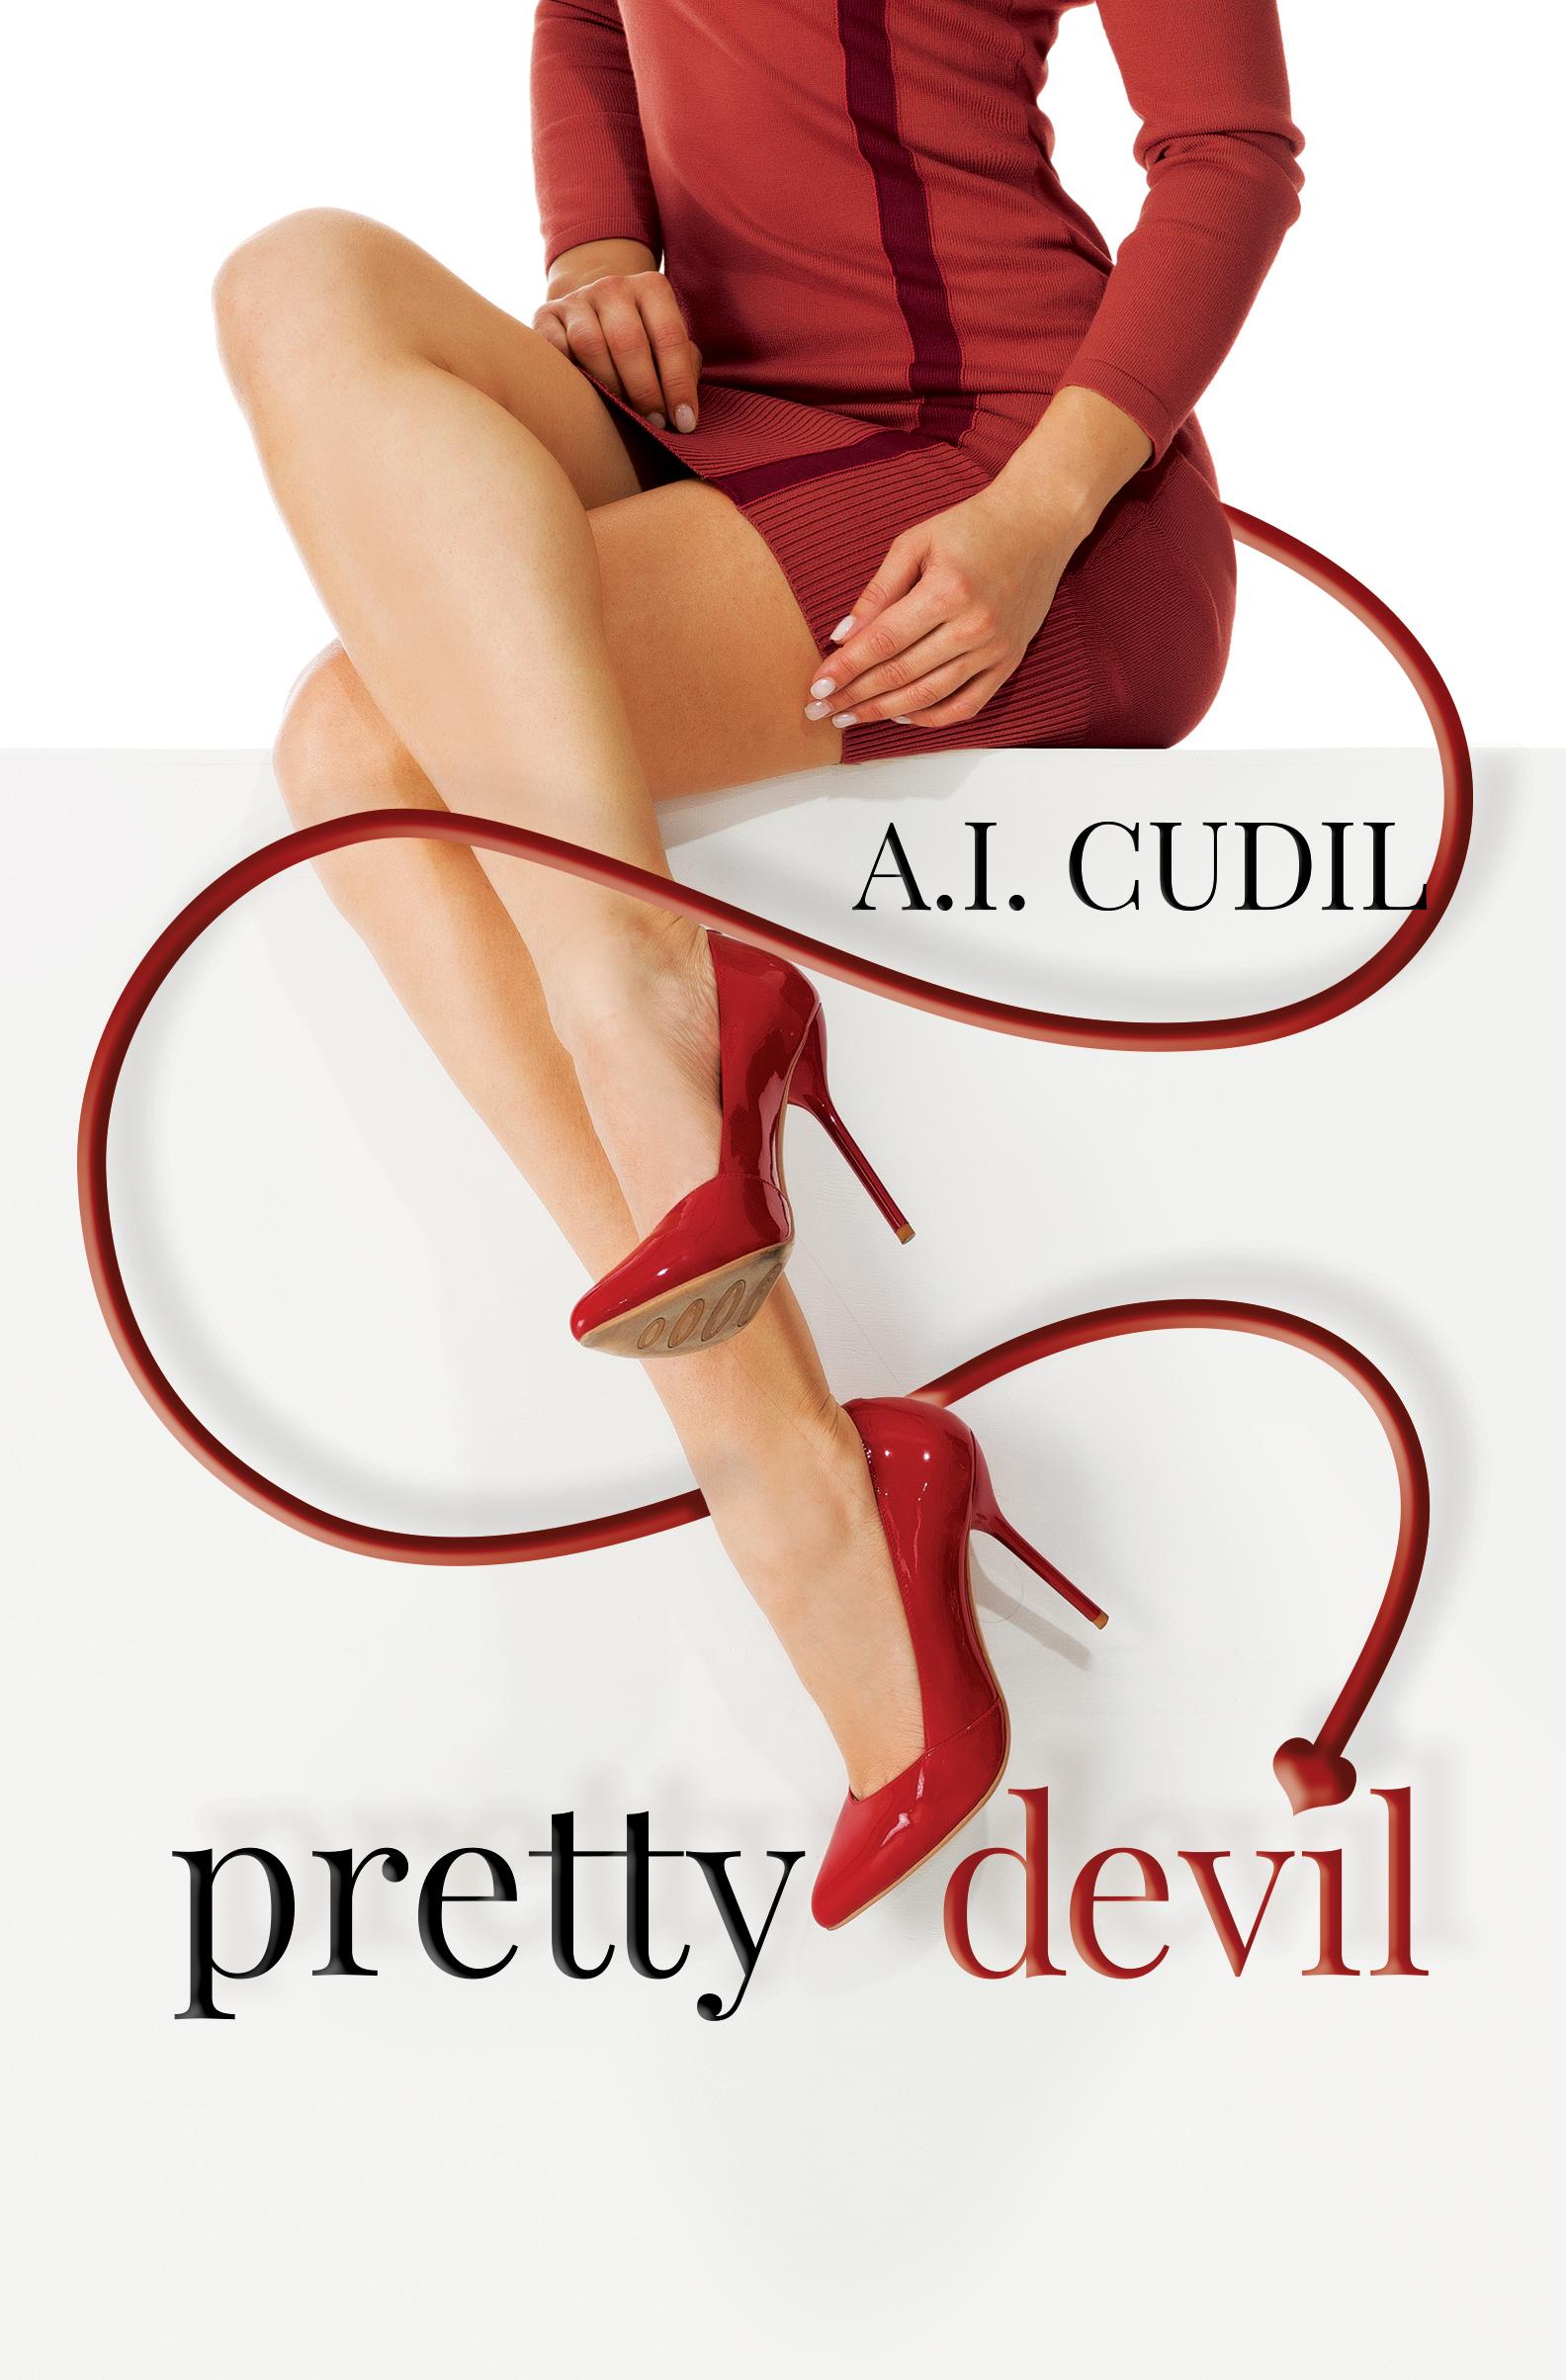 pretty-devil-2